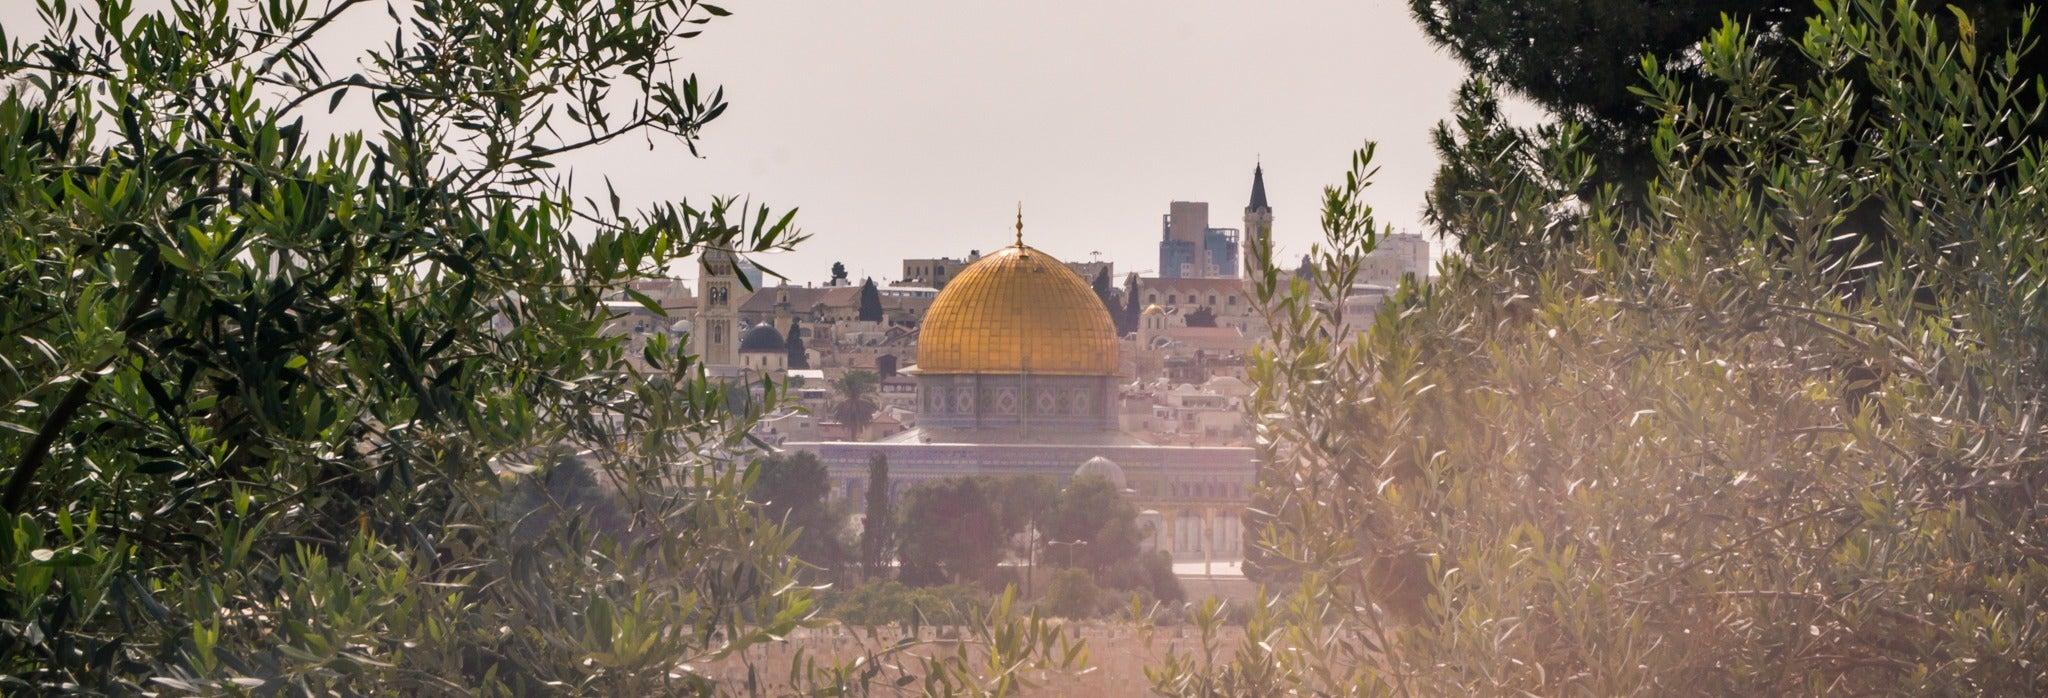 Mount of Olives Walking Tour